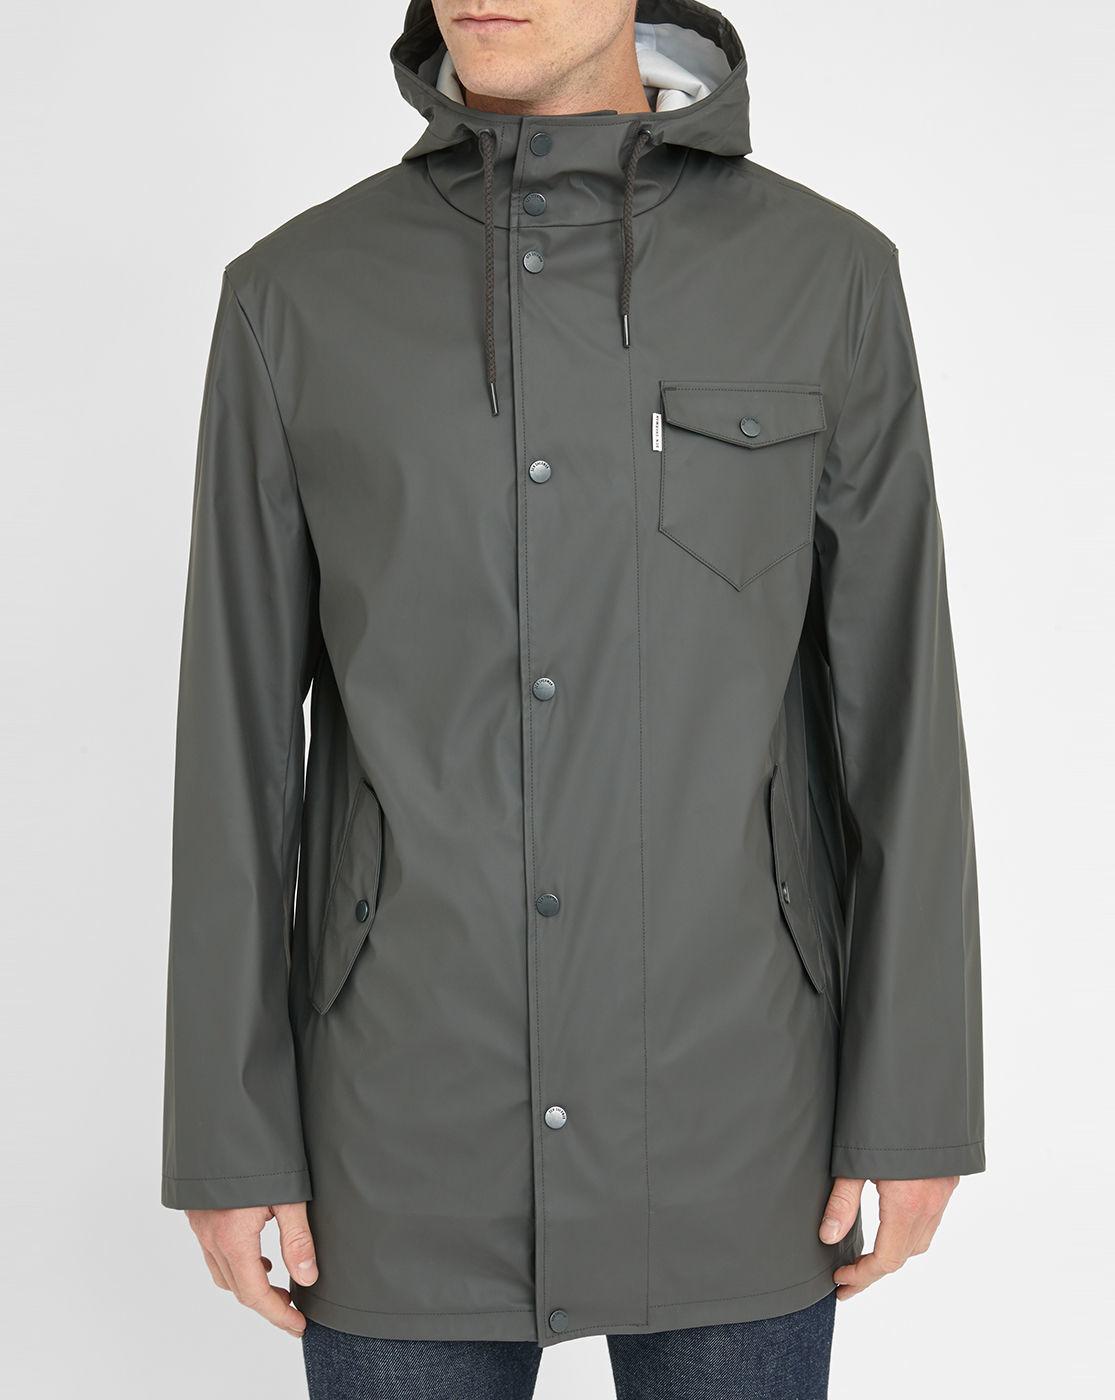 Black trench coat mens, mens long trench coat, trench coat mens.